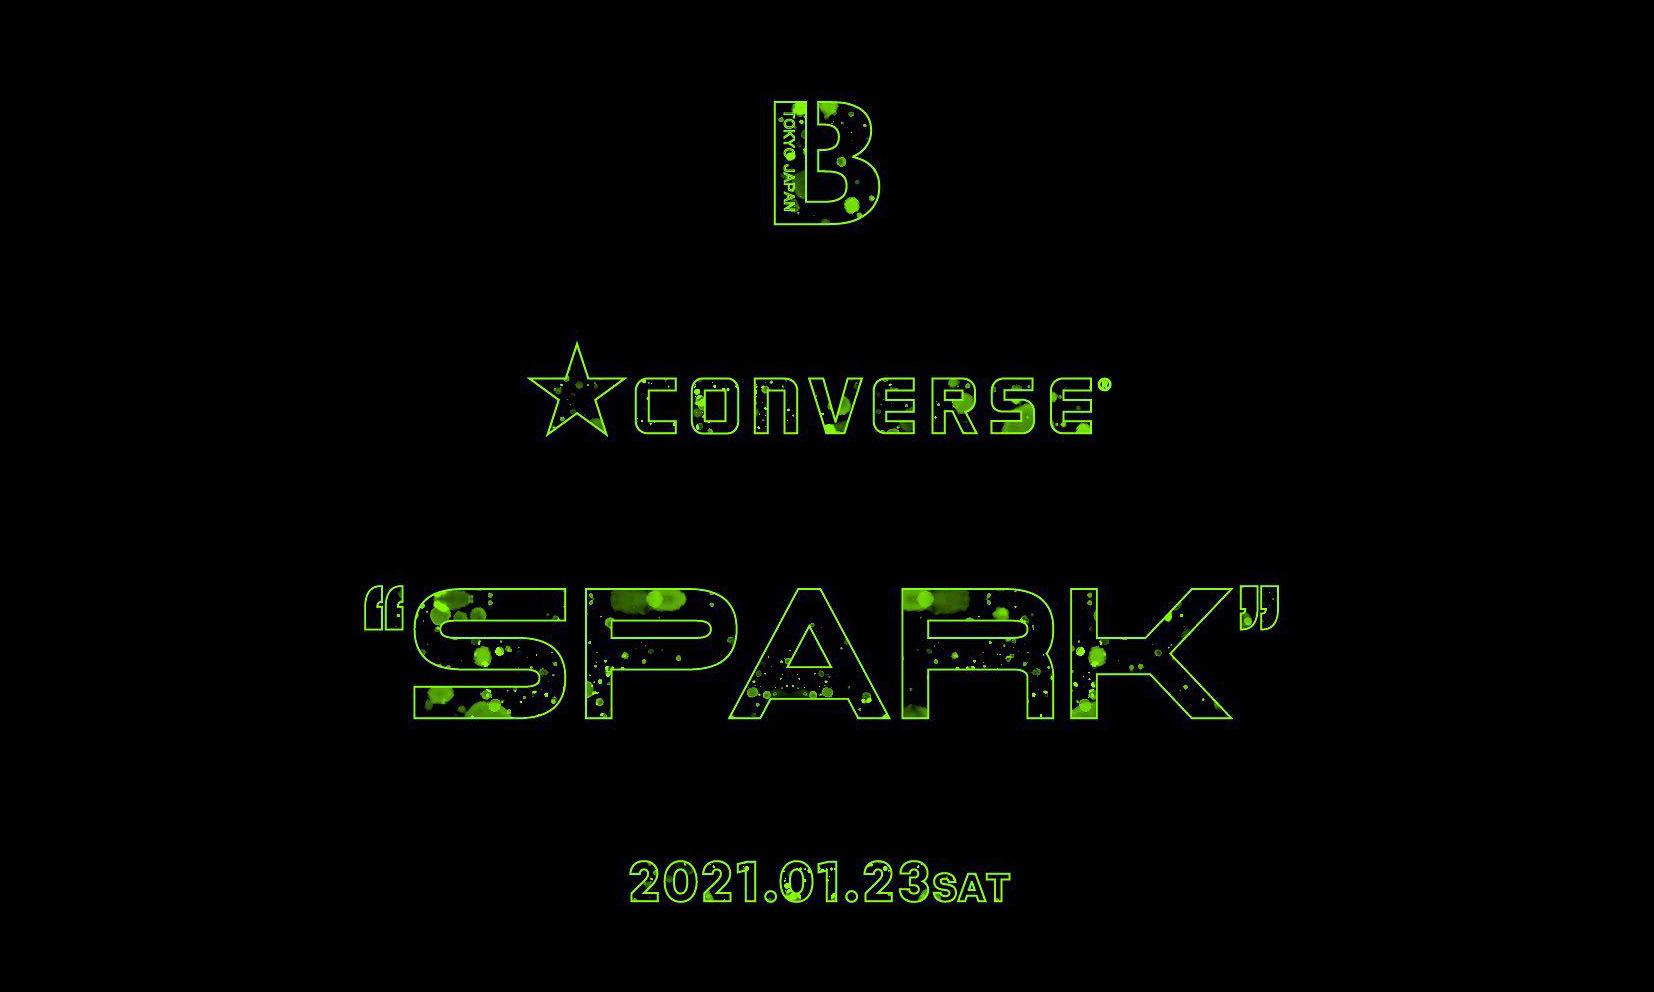 BILLY'S x CONVERSE 全新「Spark」联乘企划公开